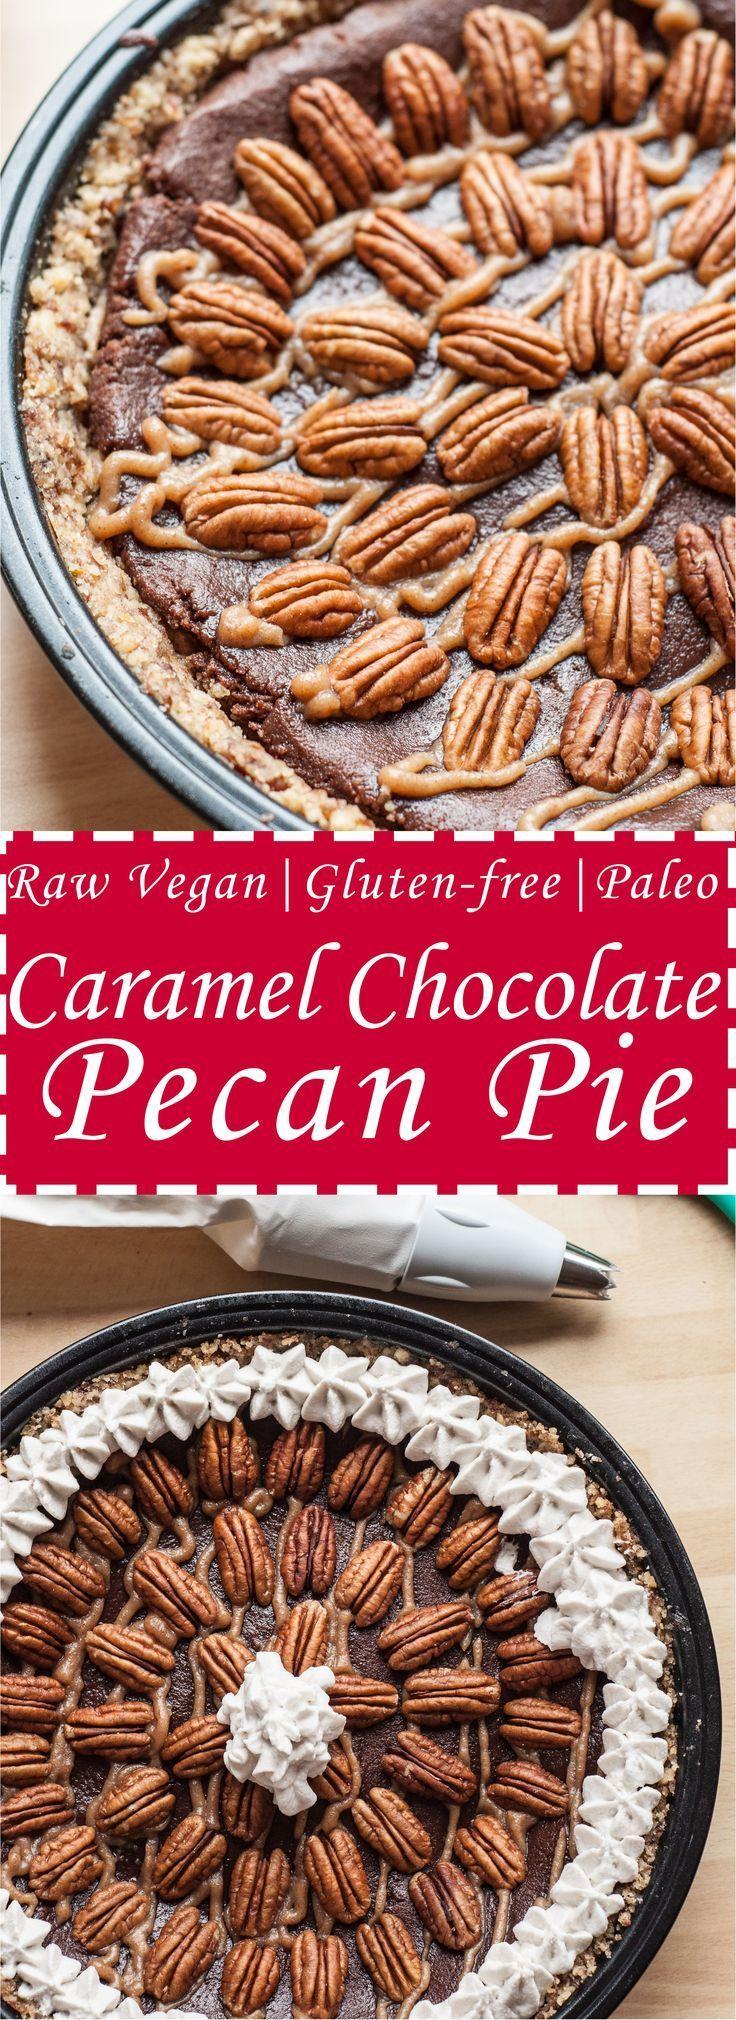 Chocolate Caramel Pecan Pie (V,GF,P) - Vegan Family Recipes Caramel Chocolate Pecan Pie Recipe w/ w